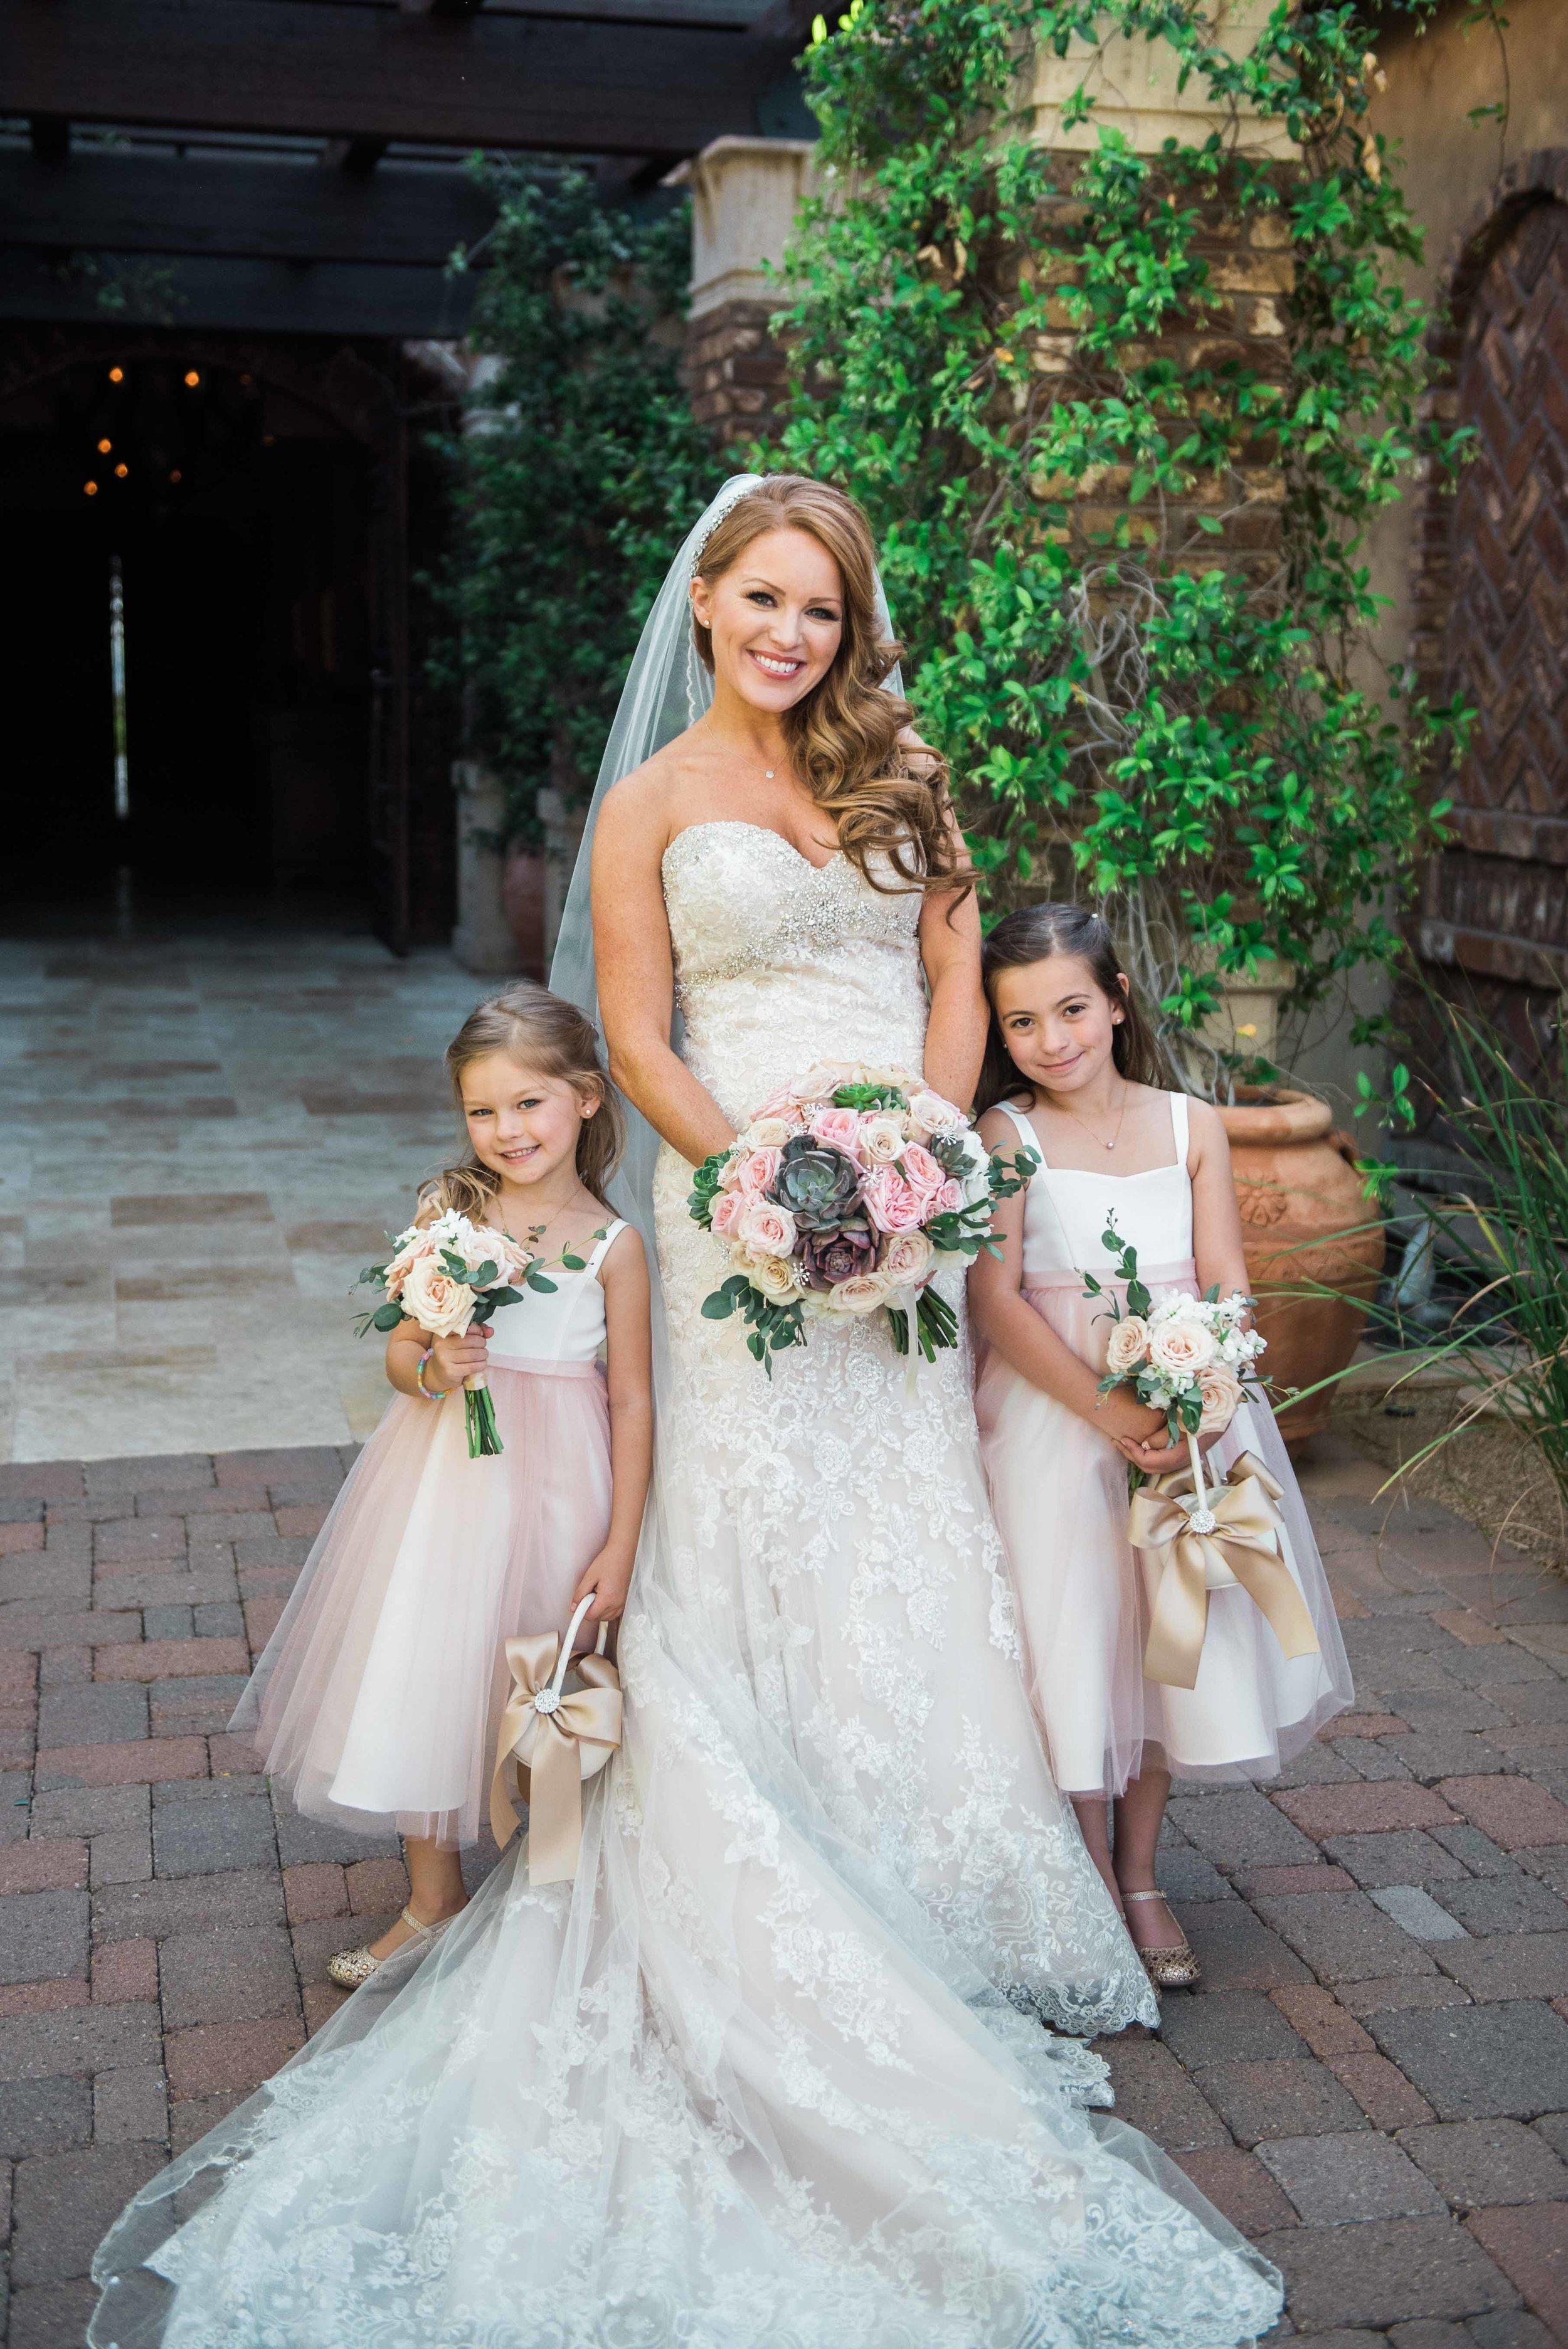 weddingwebsitesmallerpics-167.jpg